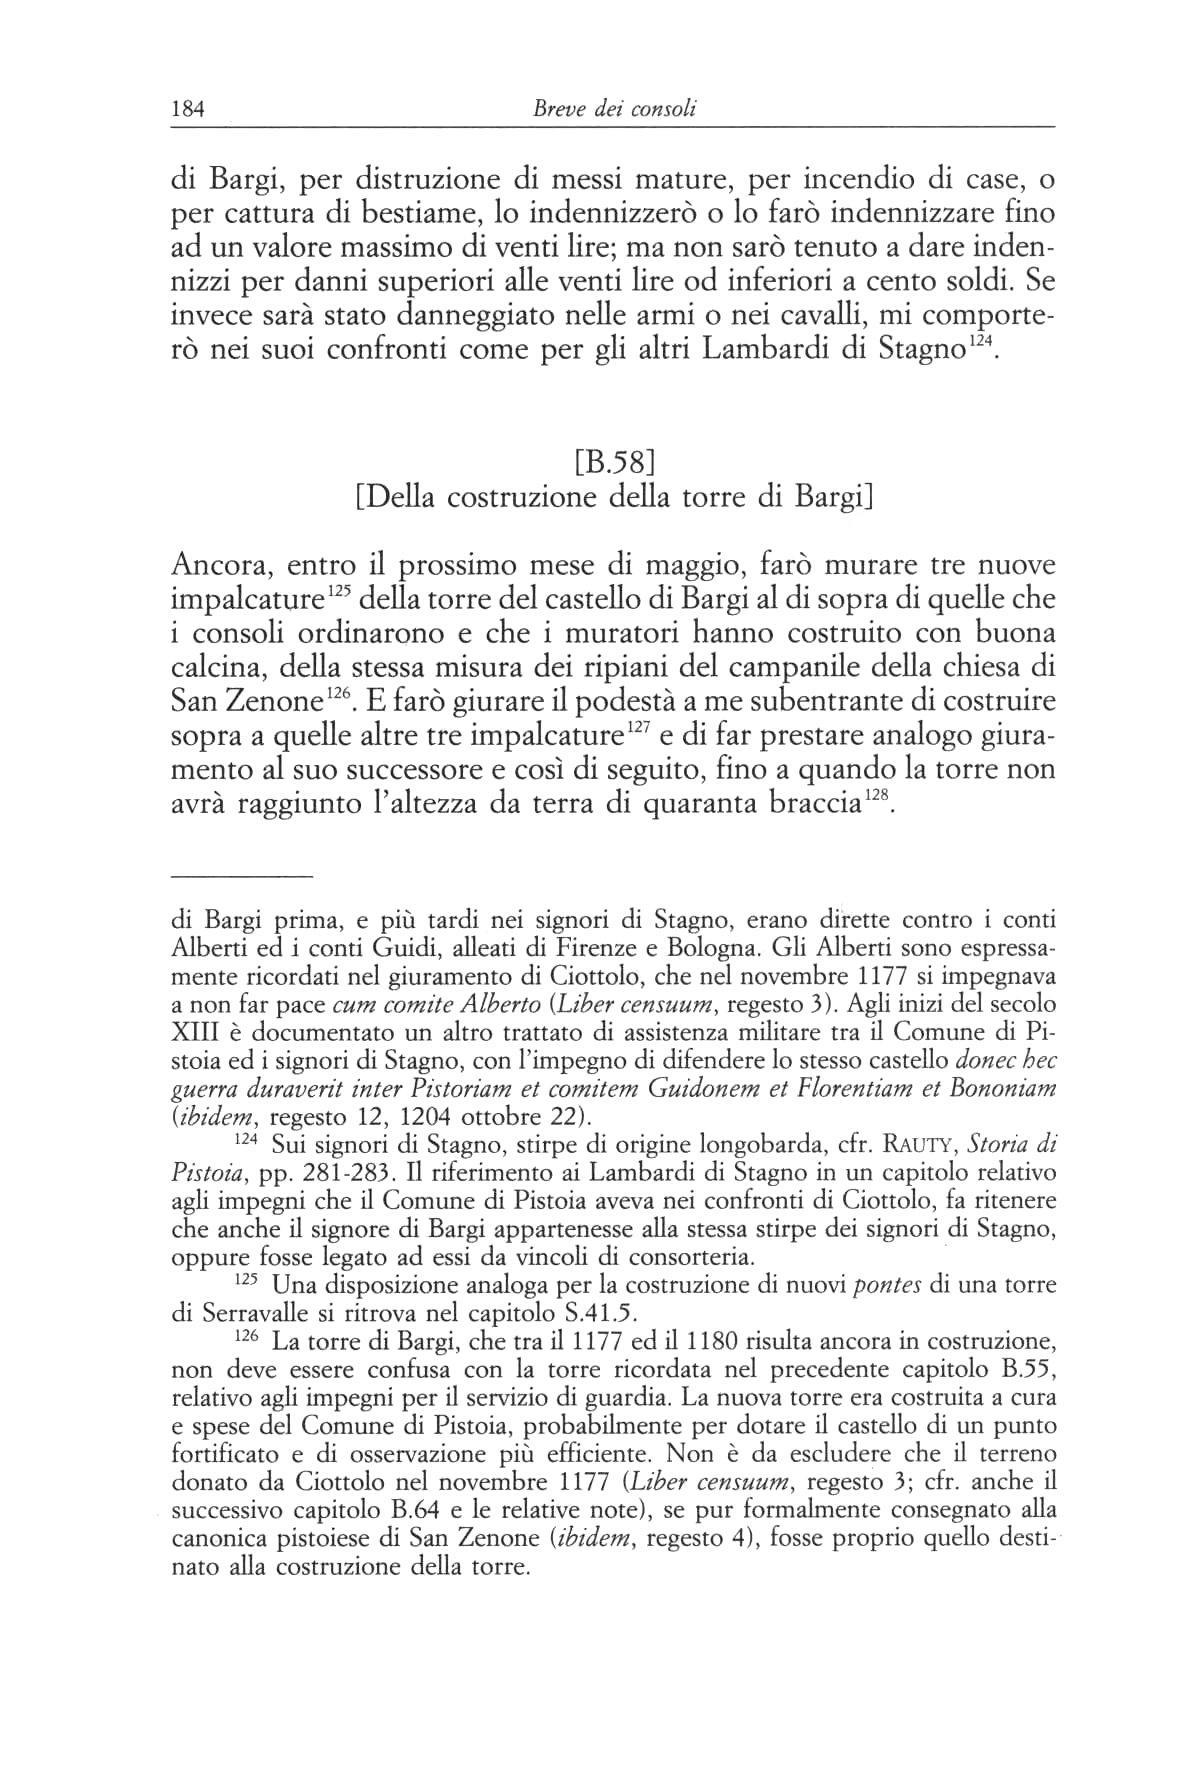 statuti pistoiesi del sec.XII 0184.jpg